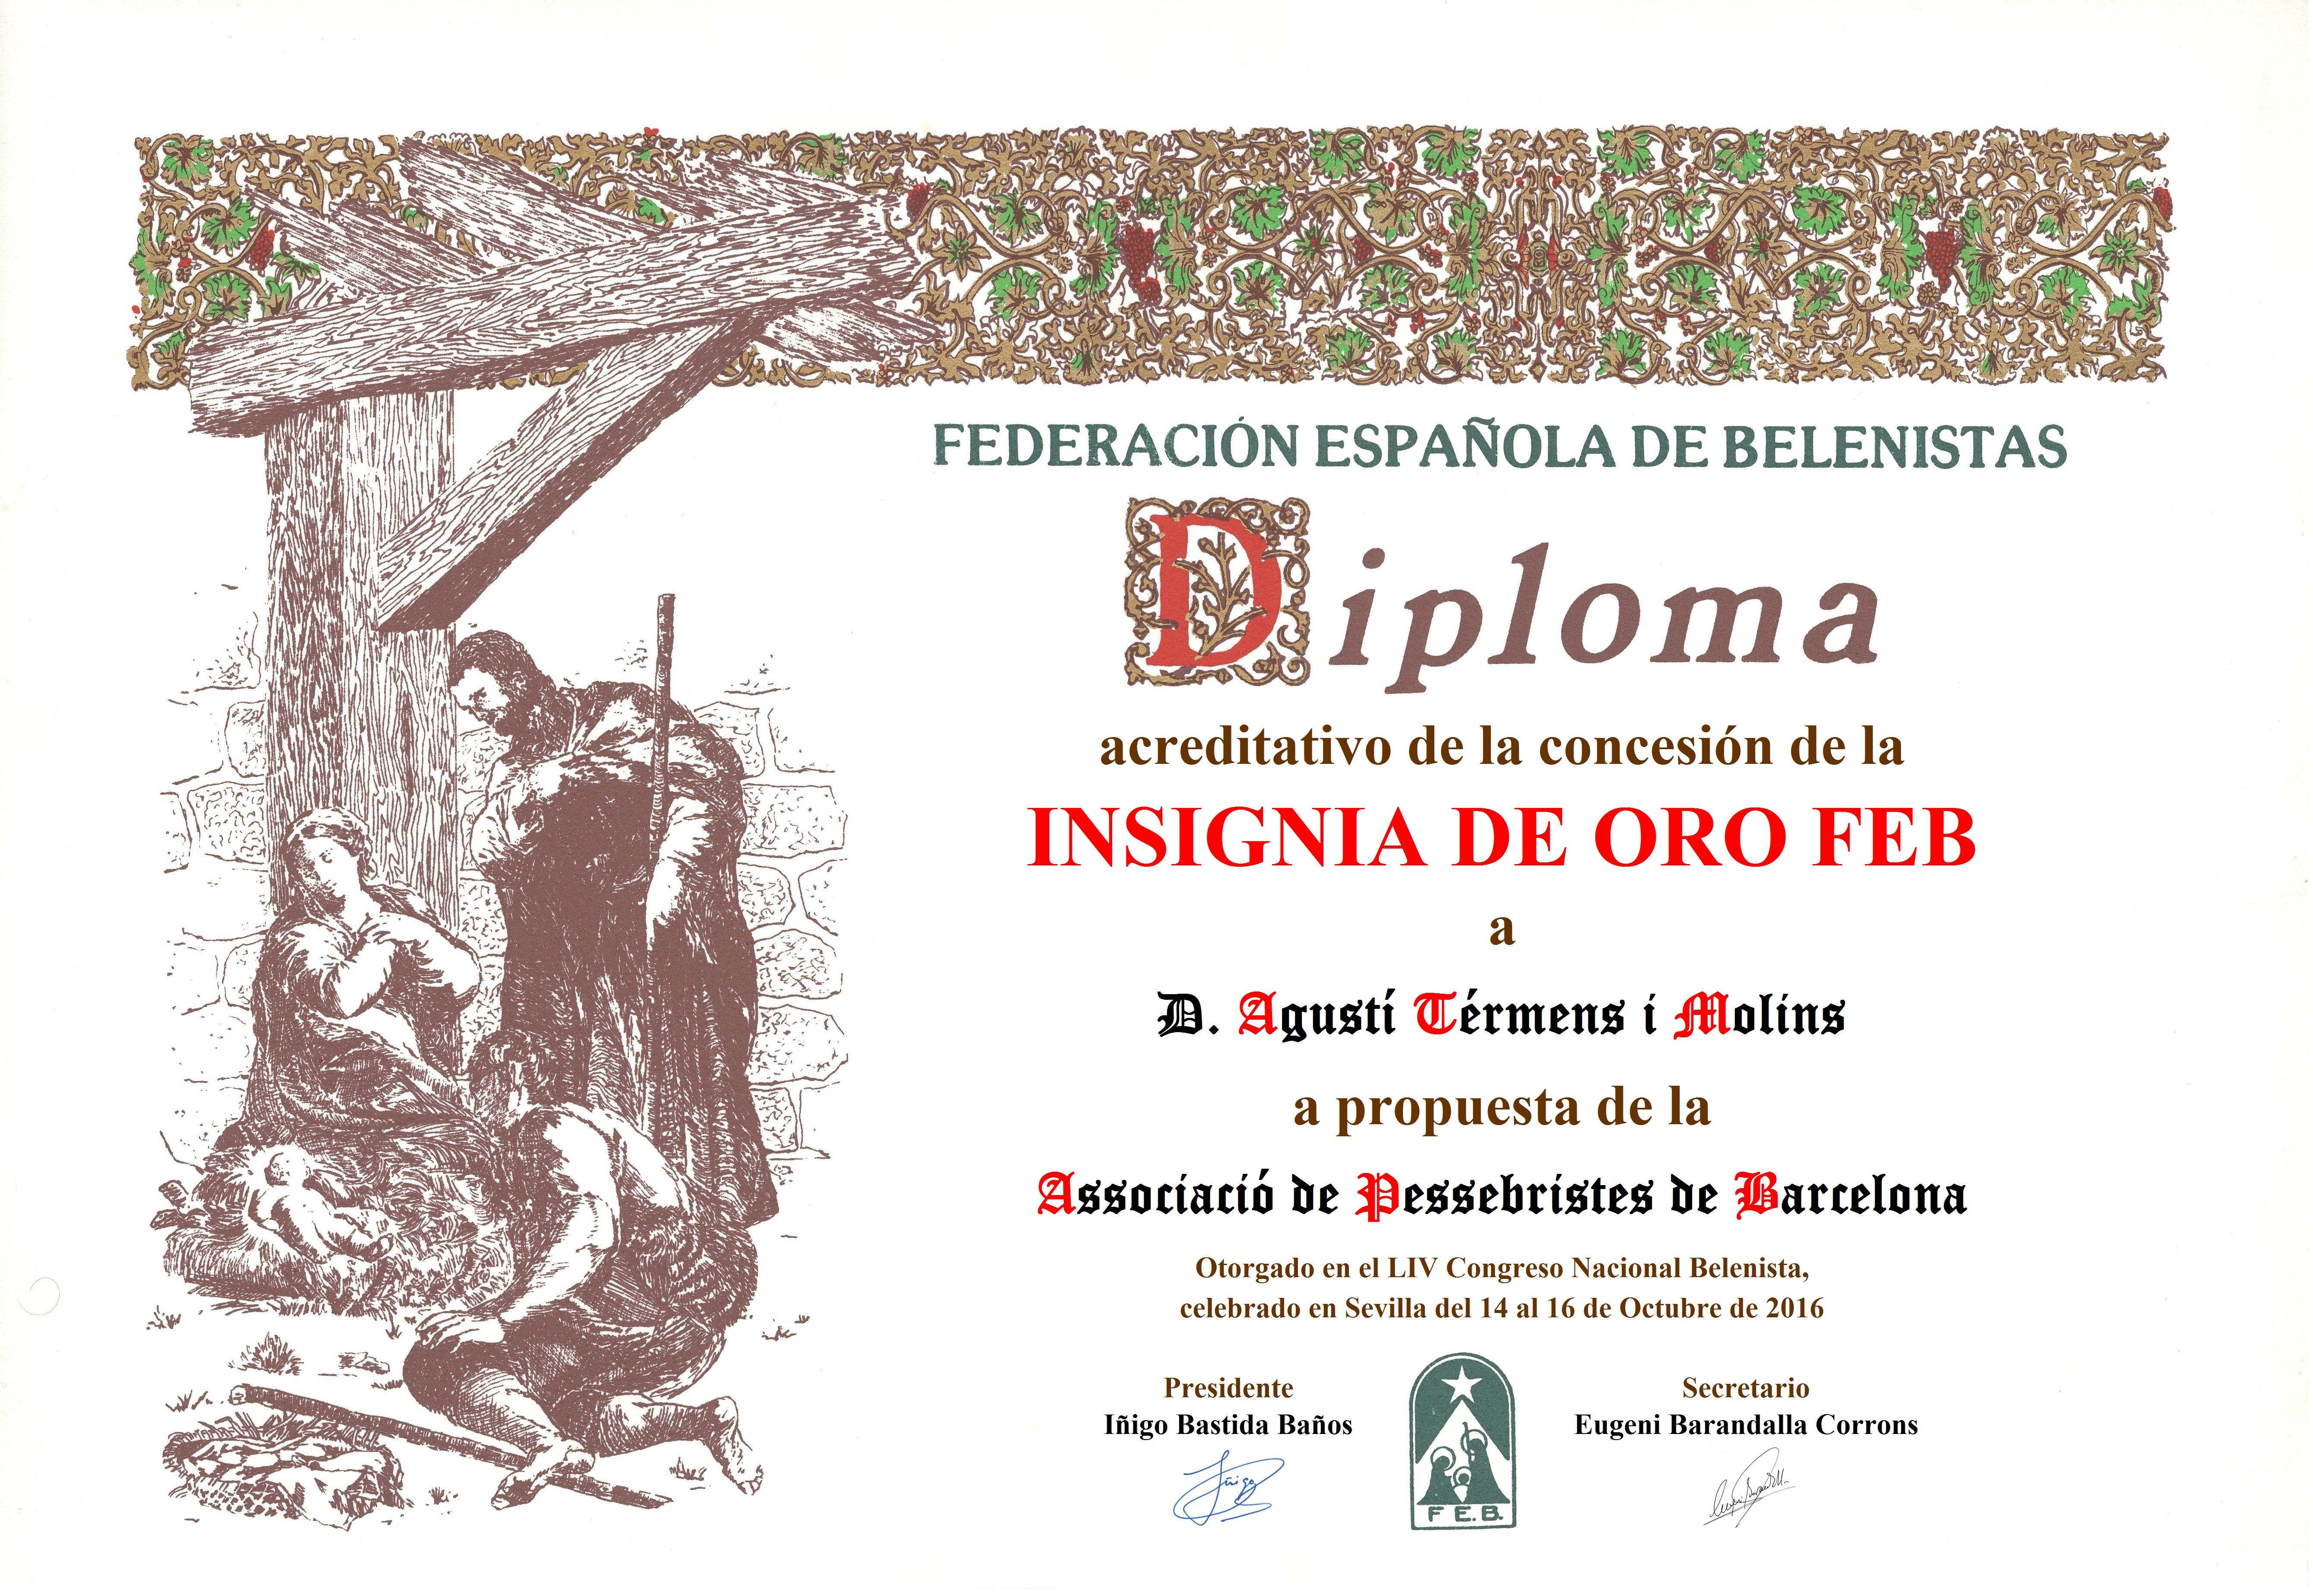 Agustí Térmens i Molins - Diploma Insignia de Oro FEB 2016